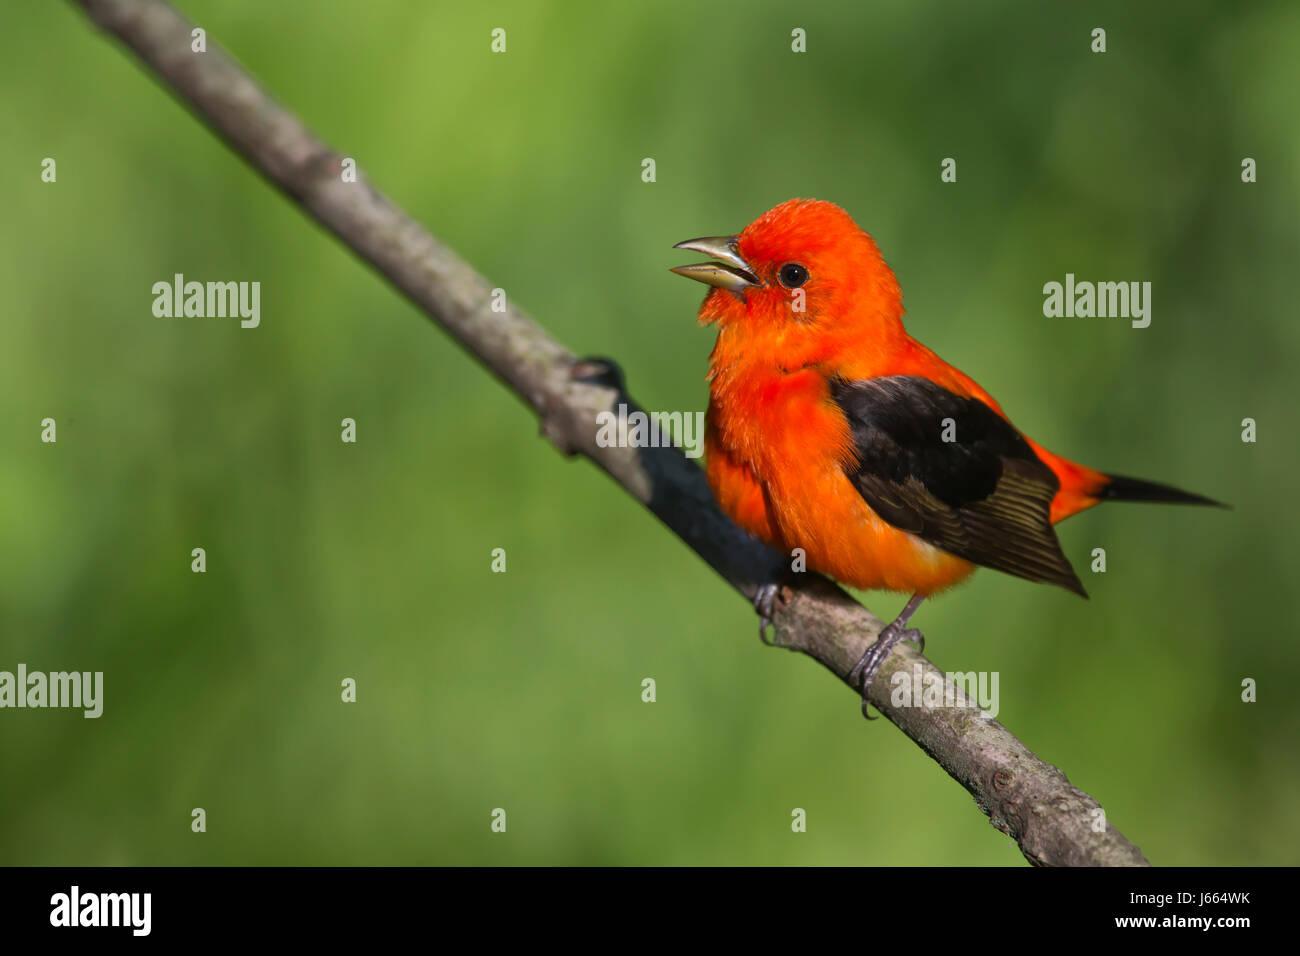 Scarlet Tanager, Piranga olivacea - Stock Image